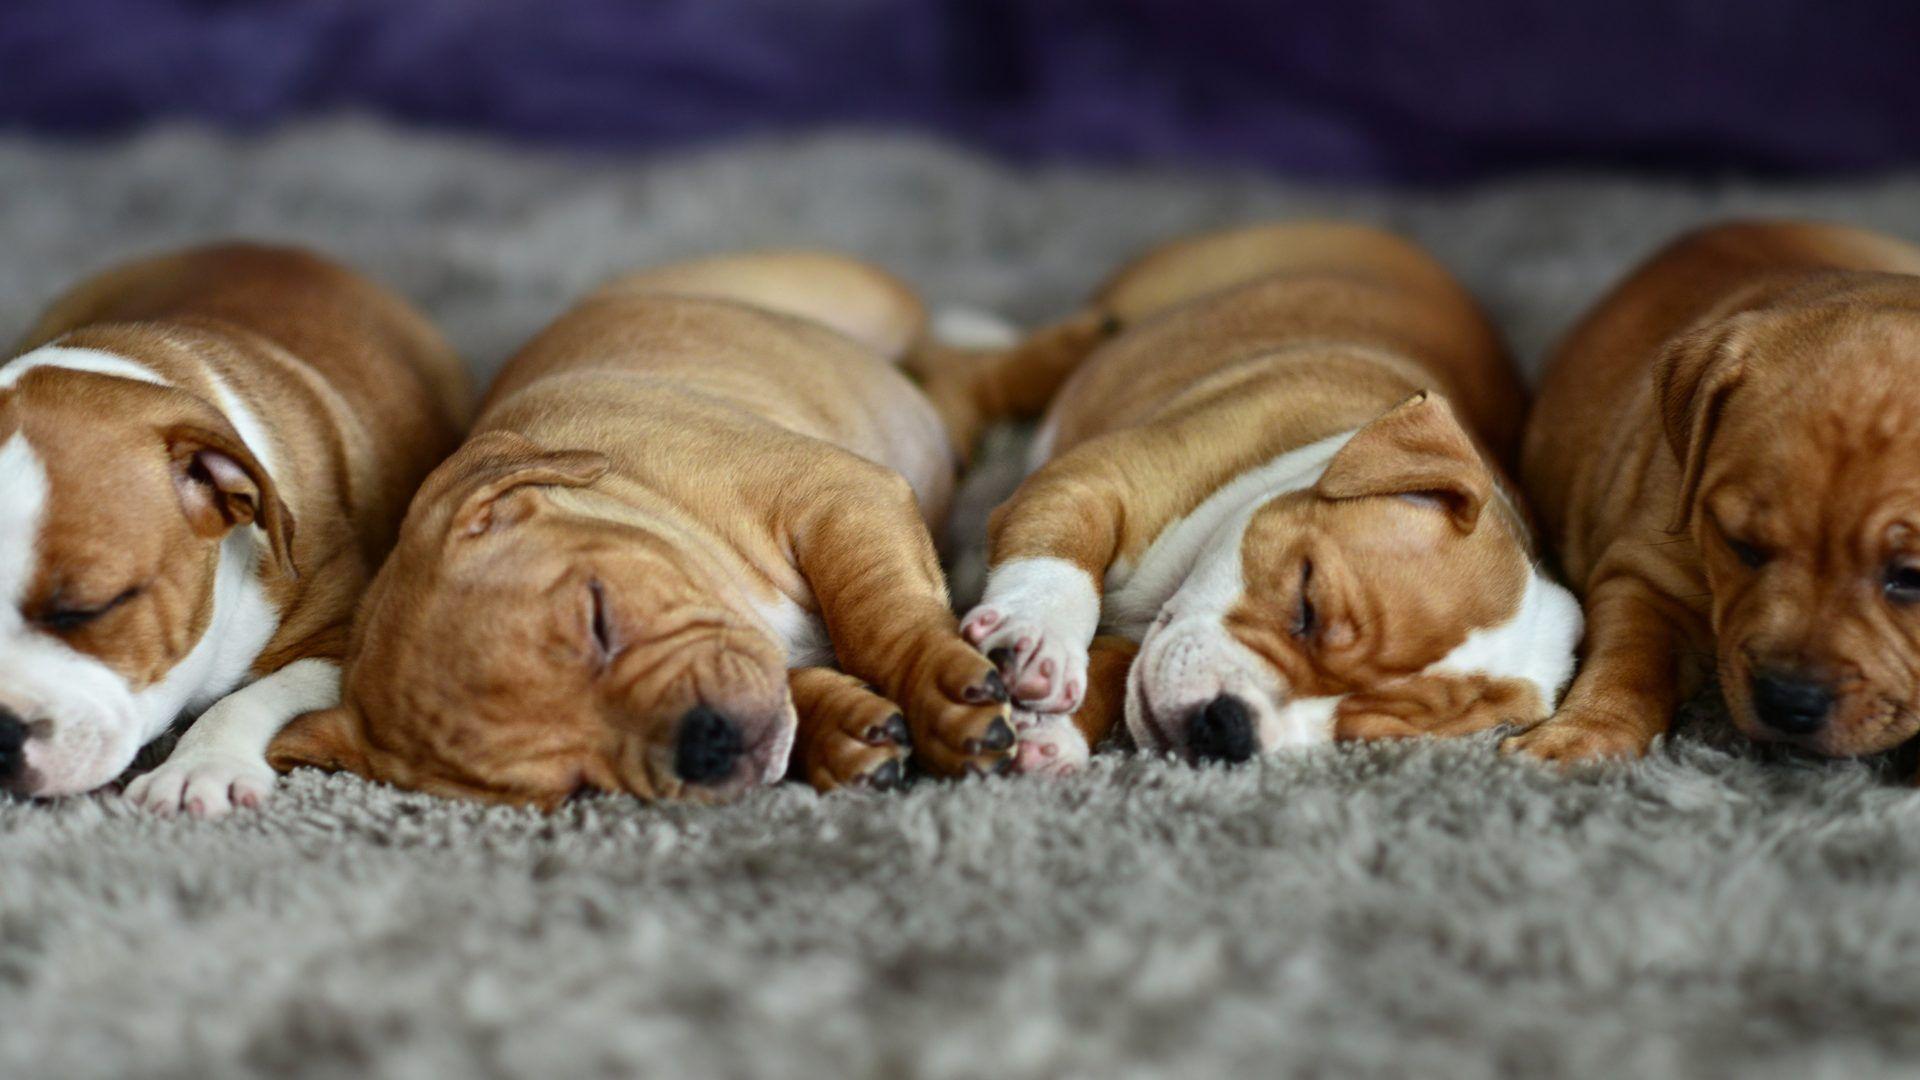 animalli - puppy dog cute sleeping baby sleep animal pictures